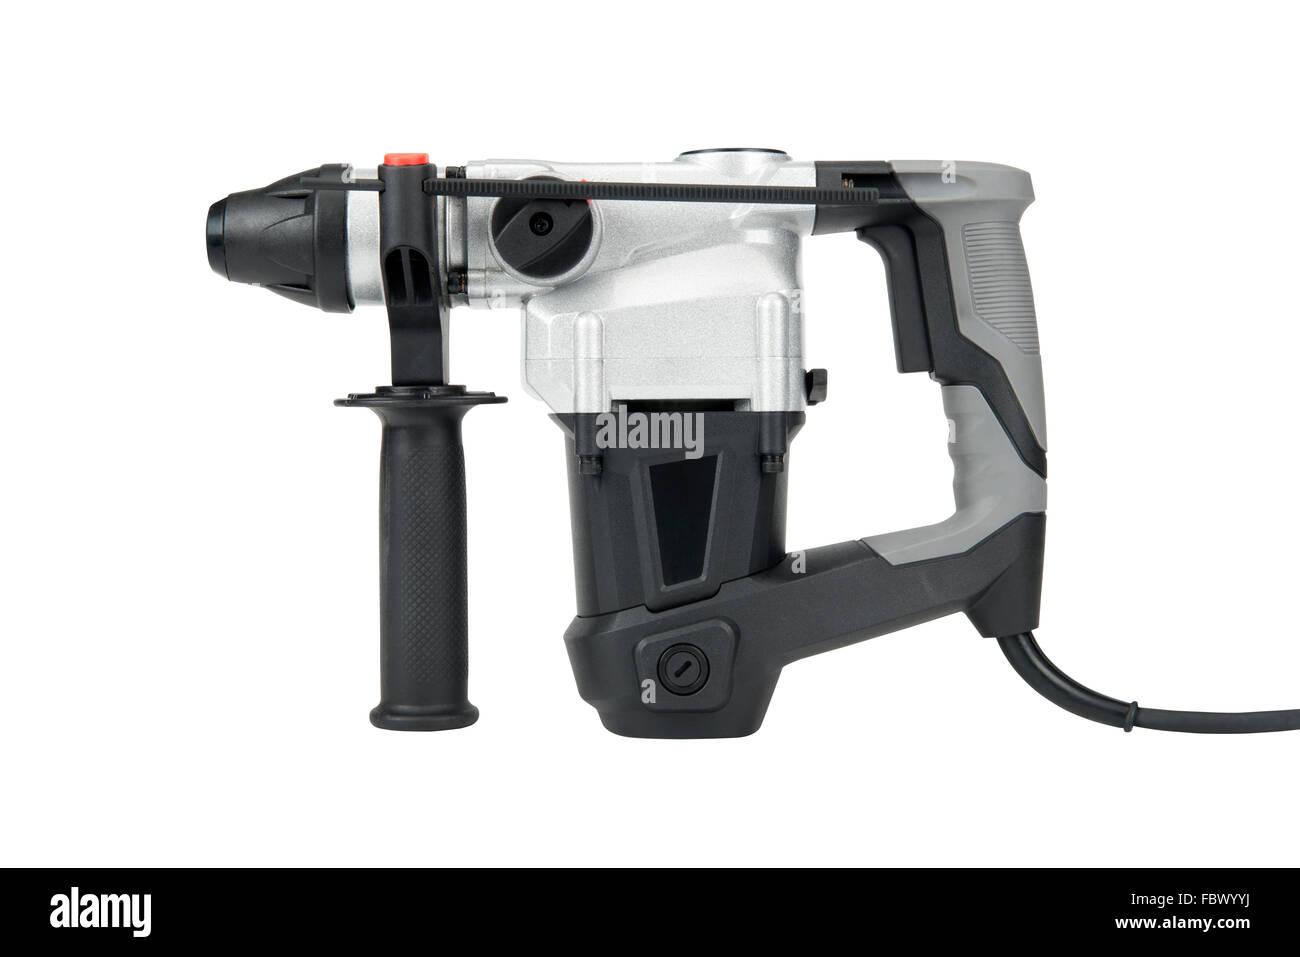 SDS hammer drill Stock Photo